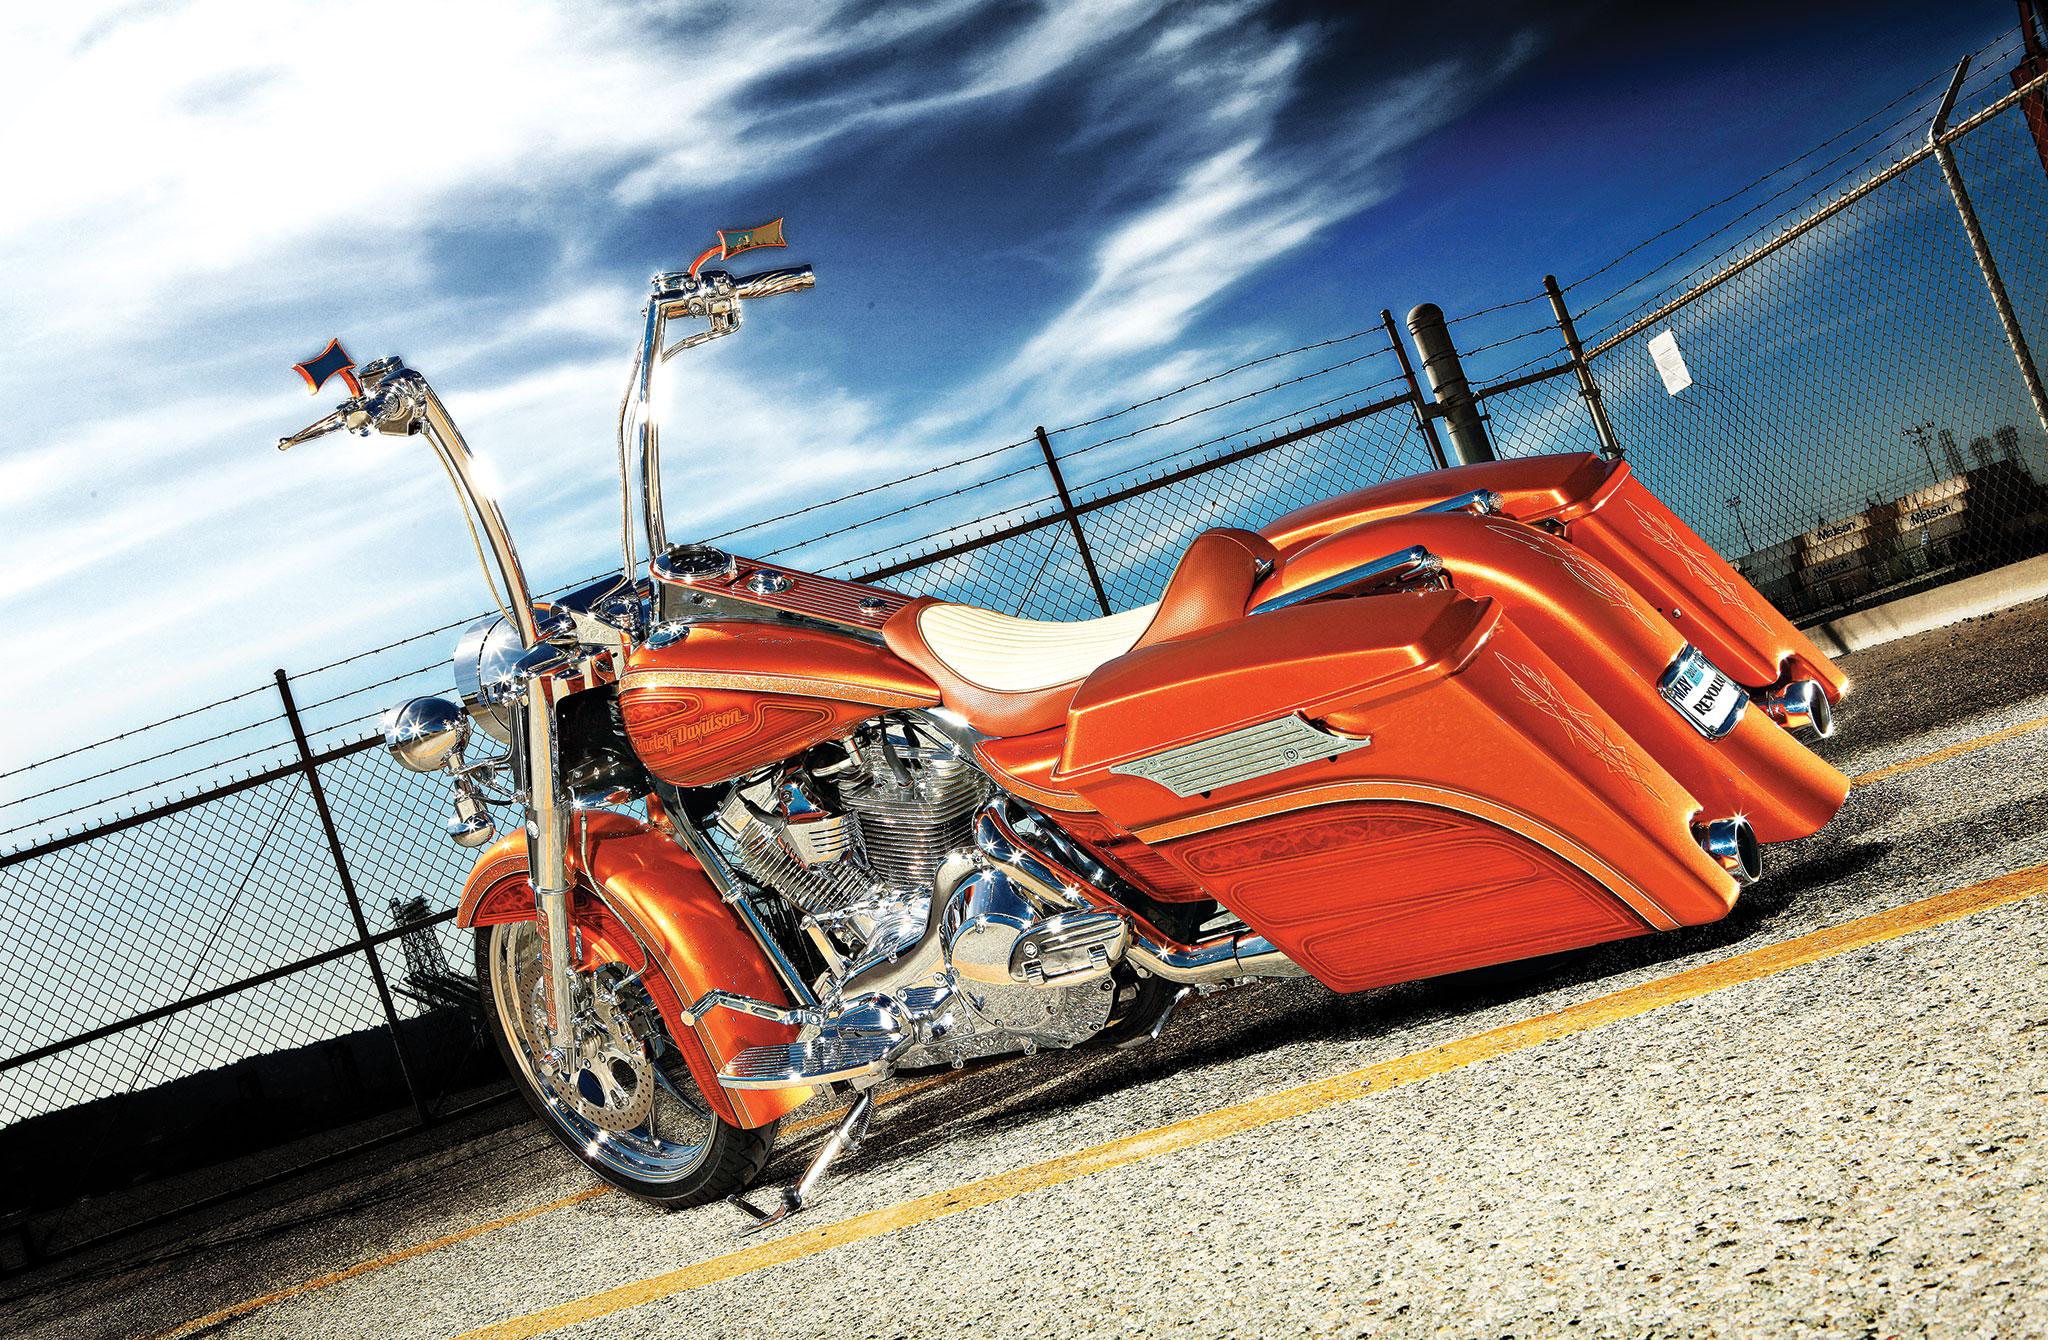 Hot Wheels Harley Davidson Road King